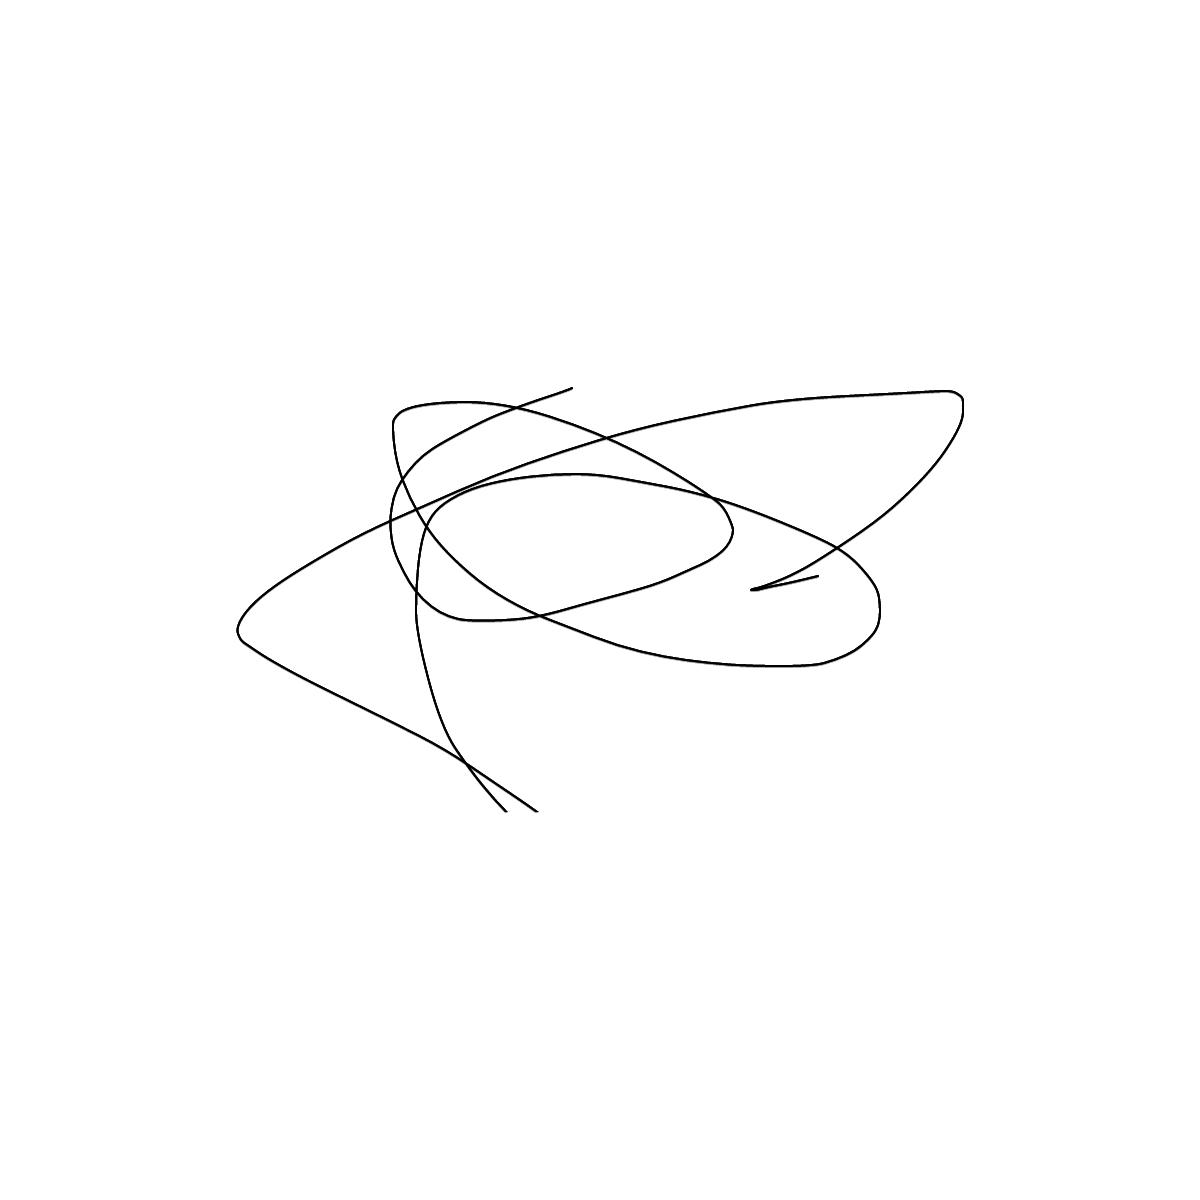 BAAAM drawing#753 lat:38.4194335937500000lng: 27.1334819793701170